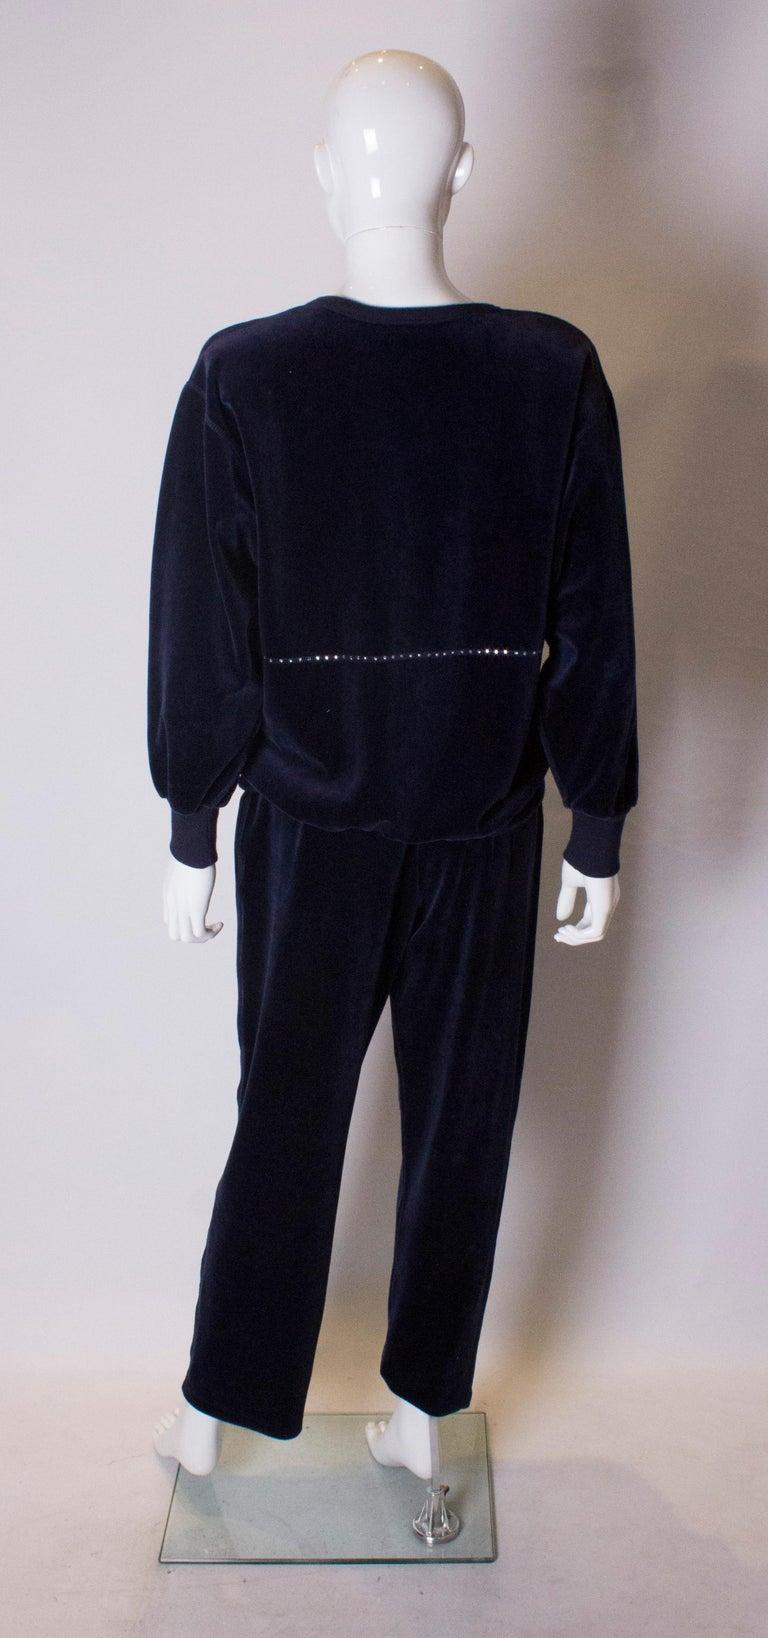 Women's Vintage Sonia Rykiel Leisure Suit For Sale